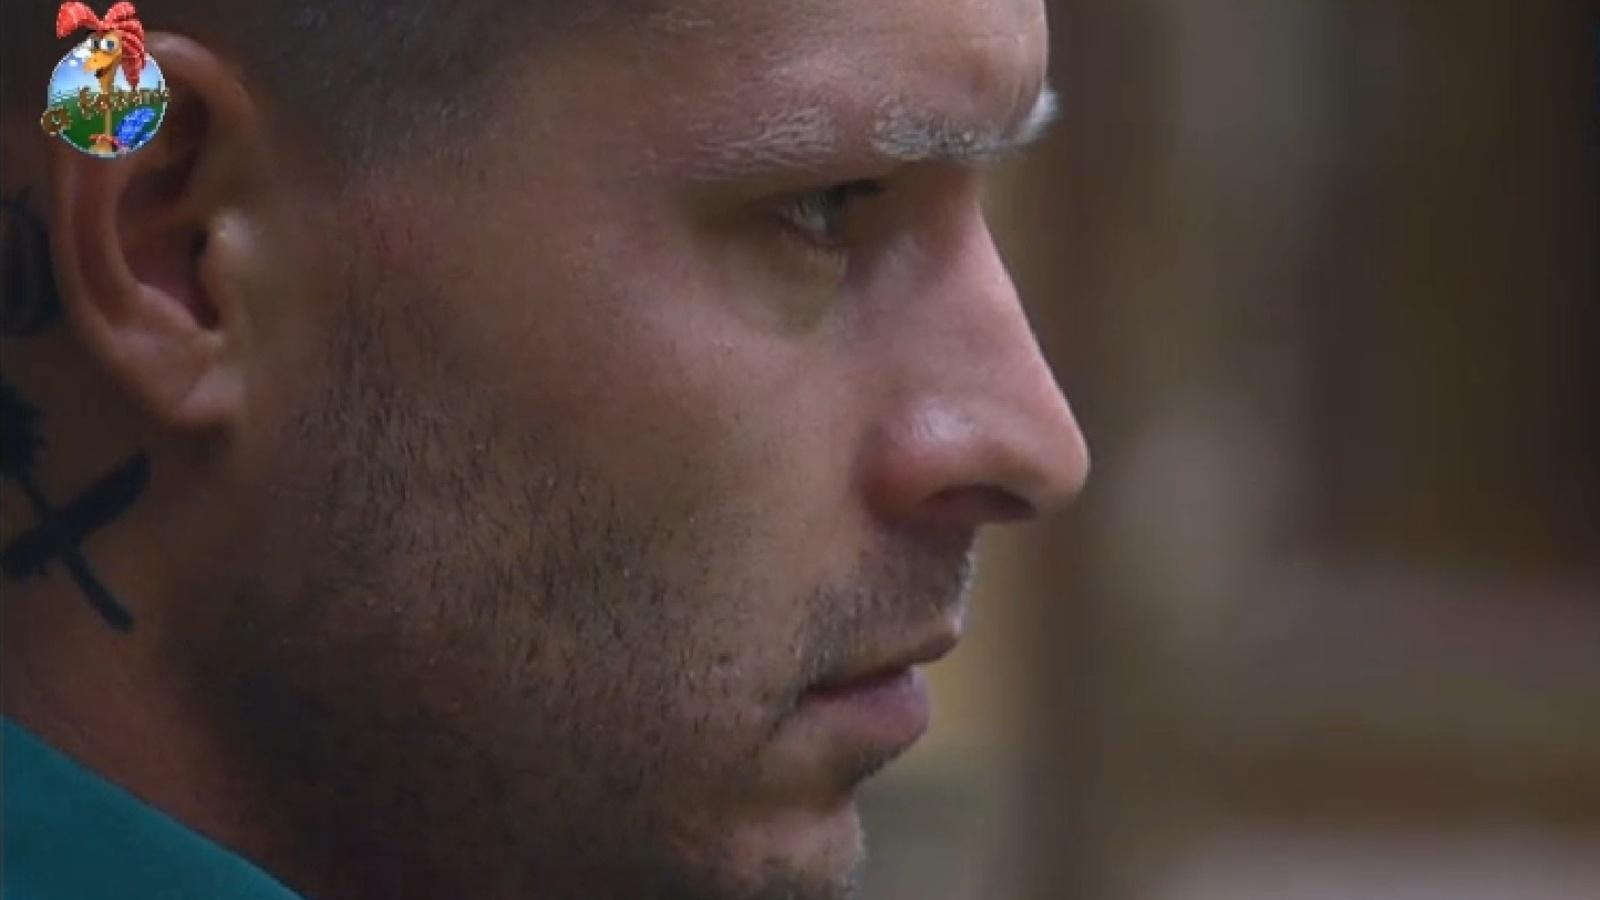 23.ago.2013 - Concentrado, Mateus espera para disputar a chave